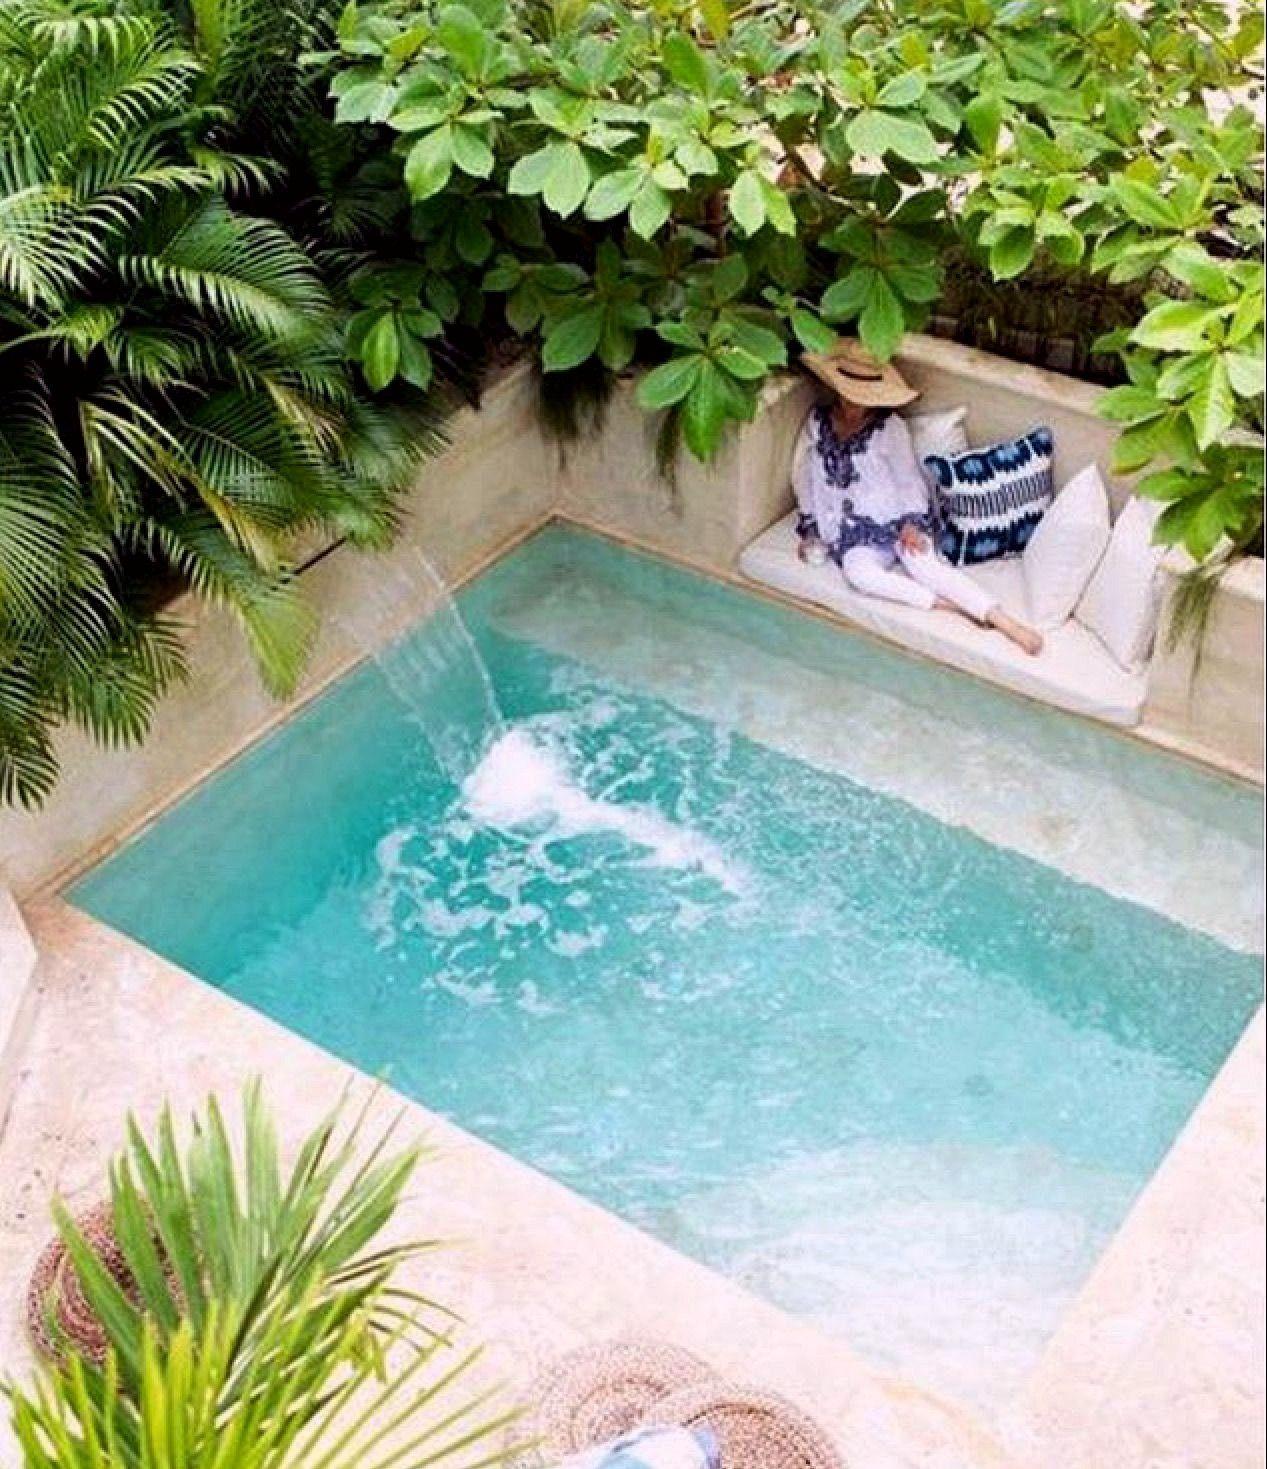 35 Small Backyard Swimming Pool Designs Ideas You Ll Love Homelovers Backyard Pool Small Pool Design Backyard Pool Designs